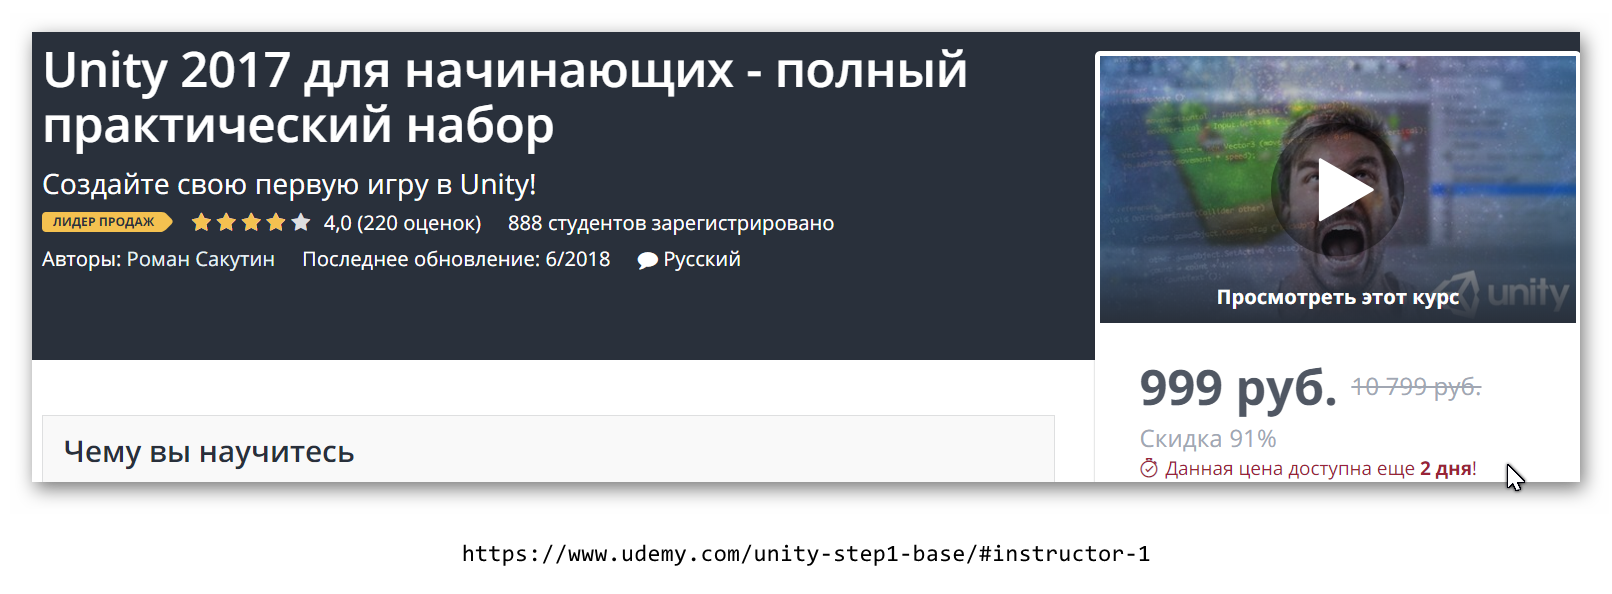 ashampoo_snap_26-июня-2019-г-_11h56m12s_002_-png.487568